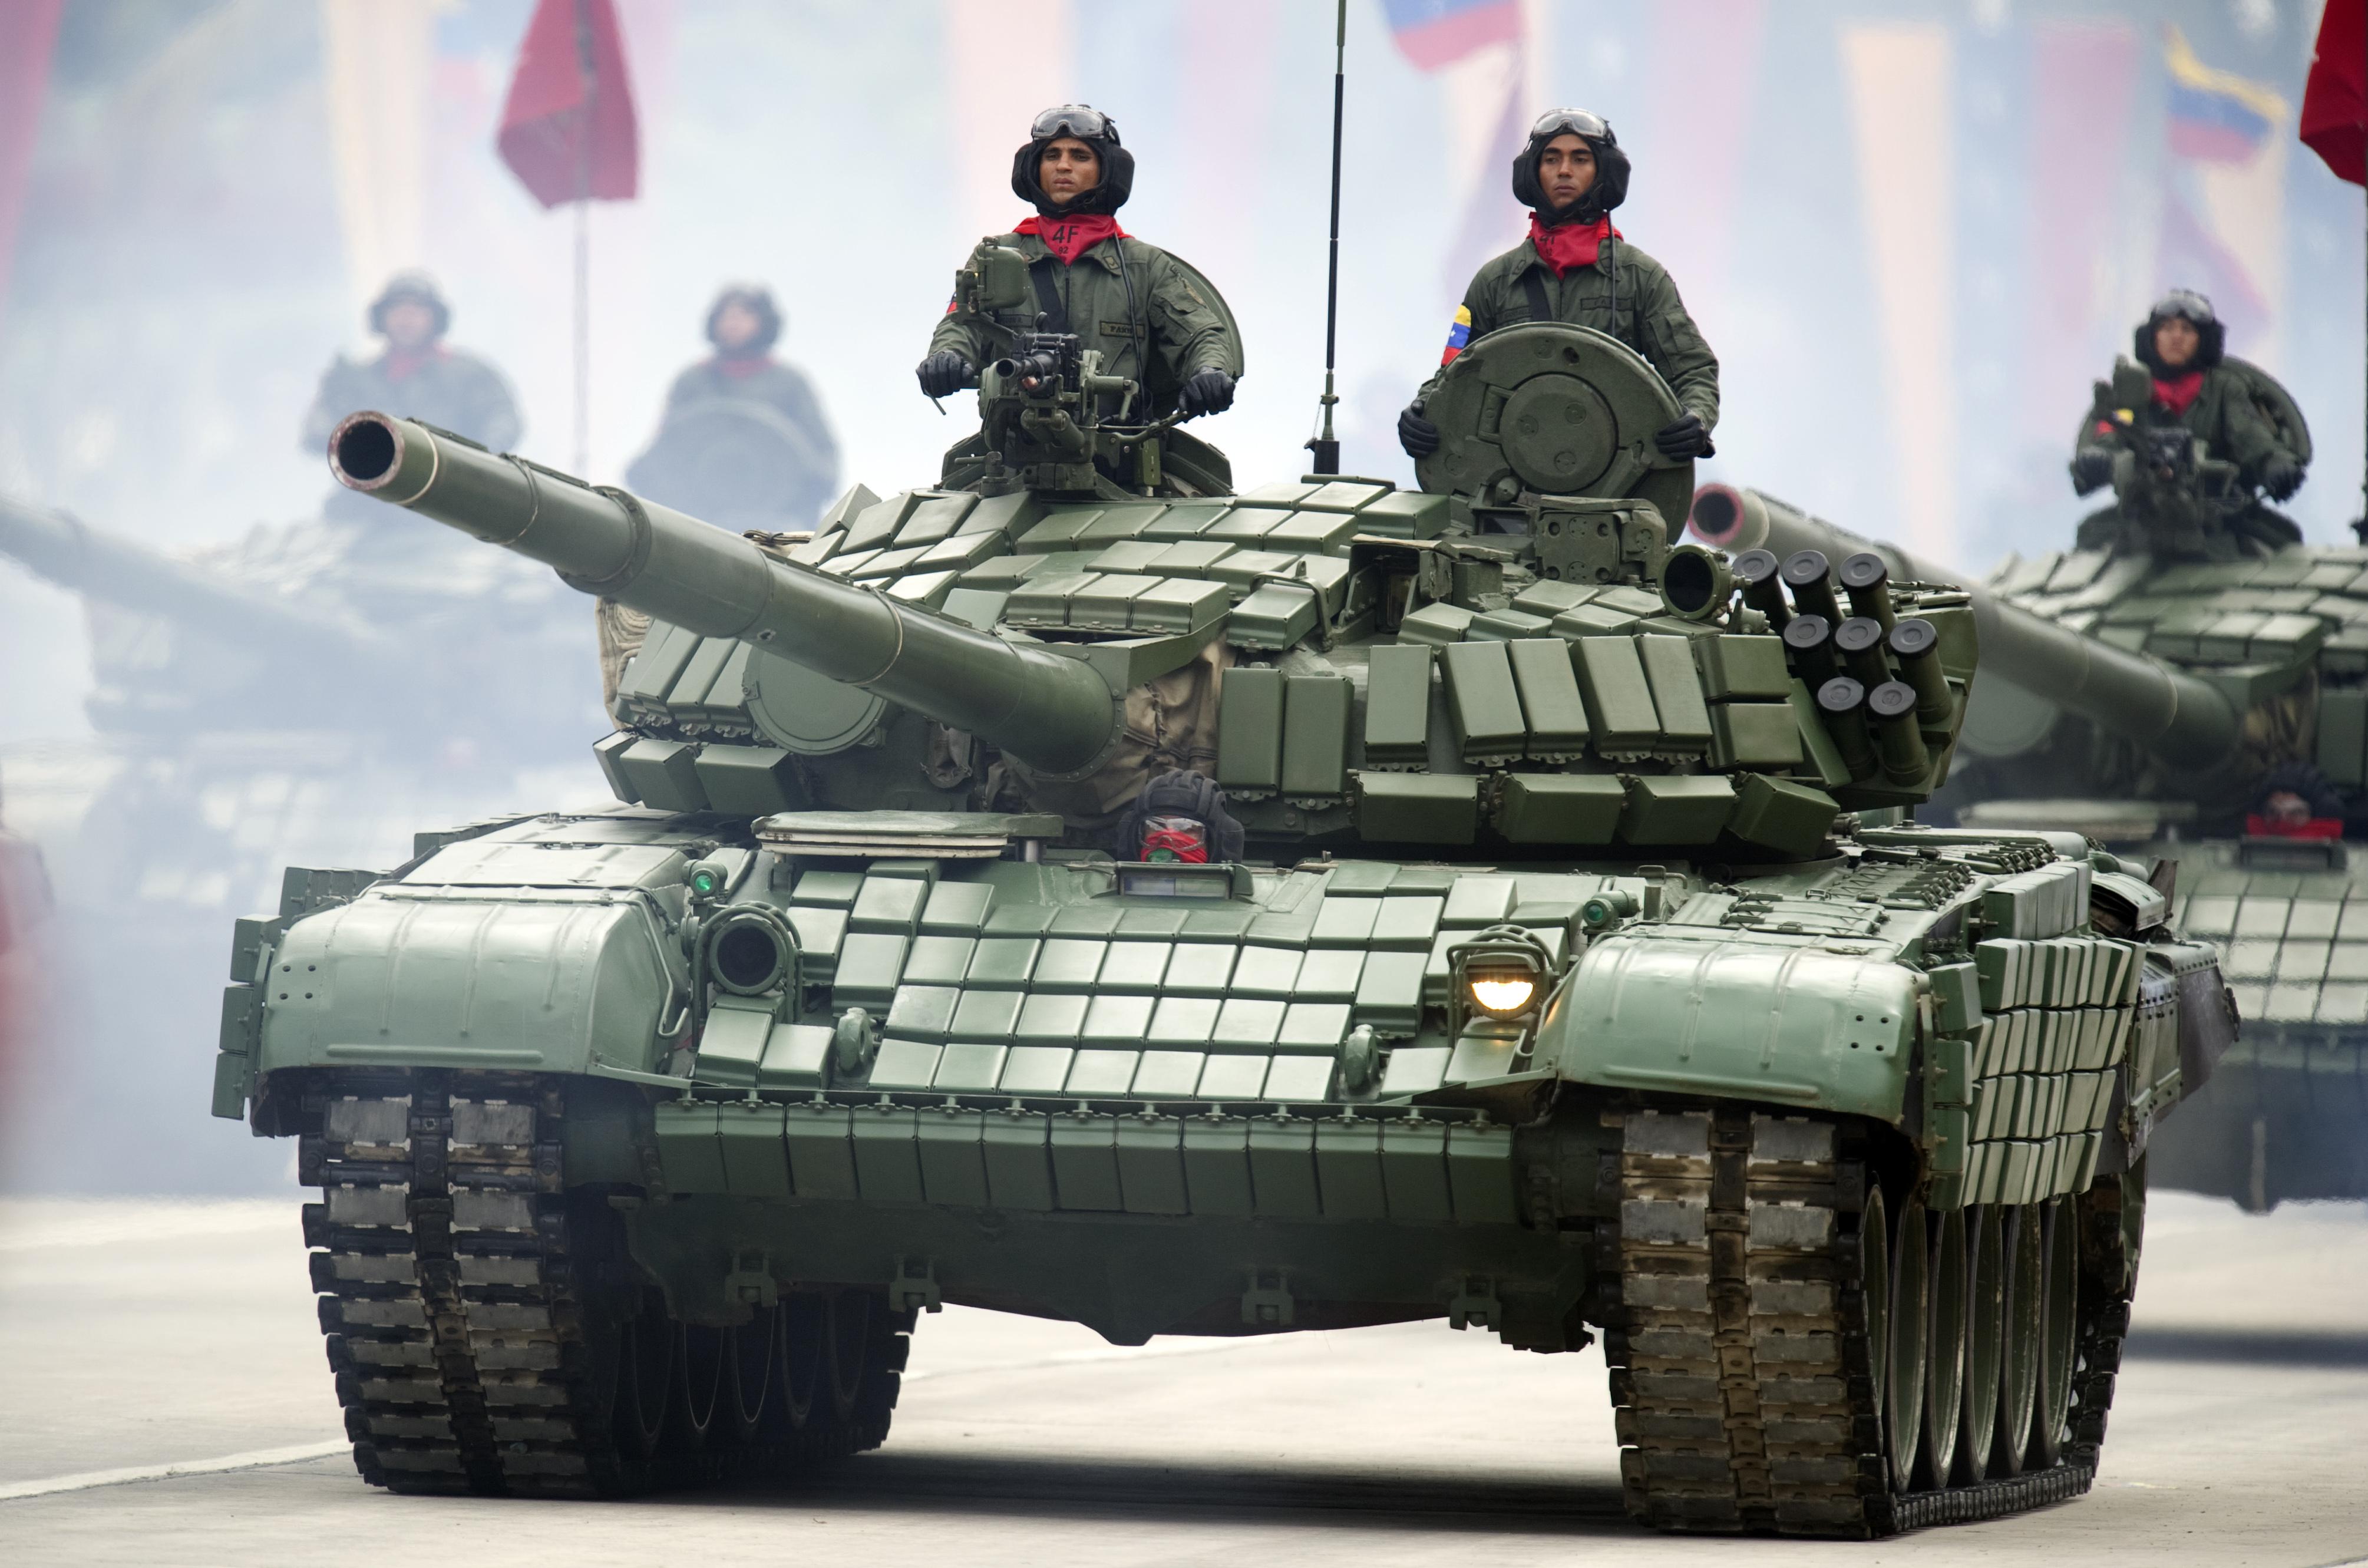 Por qu nicaragua le compr 50 tanques a rusia univision for Criadero de cachamas en tanques